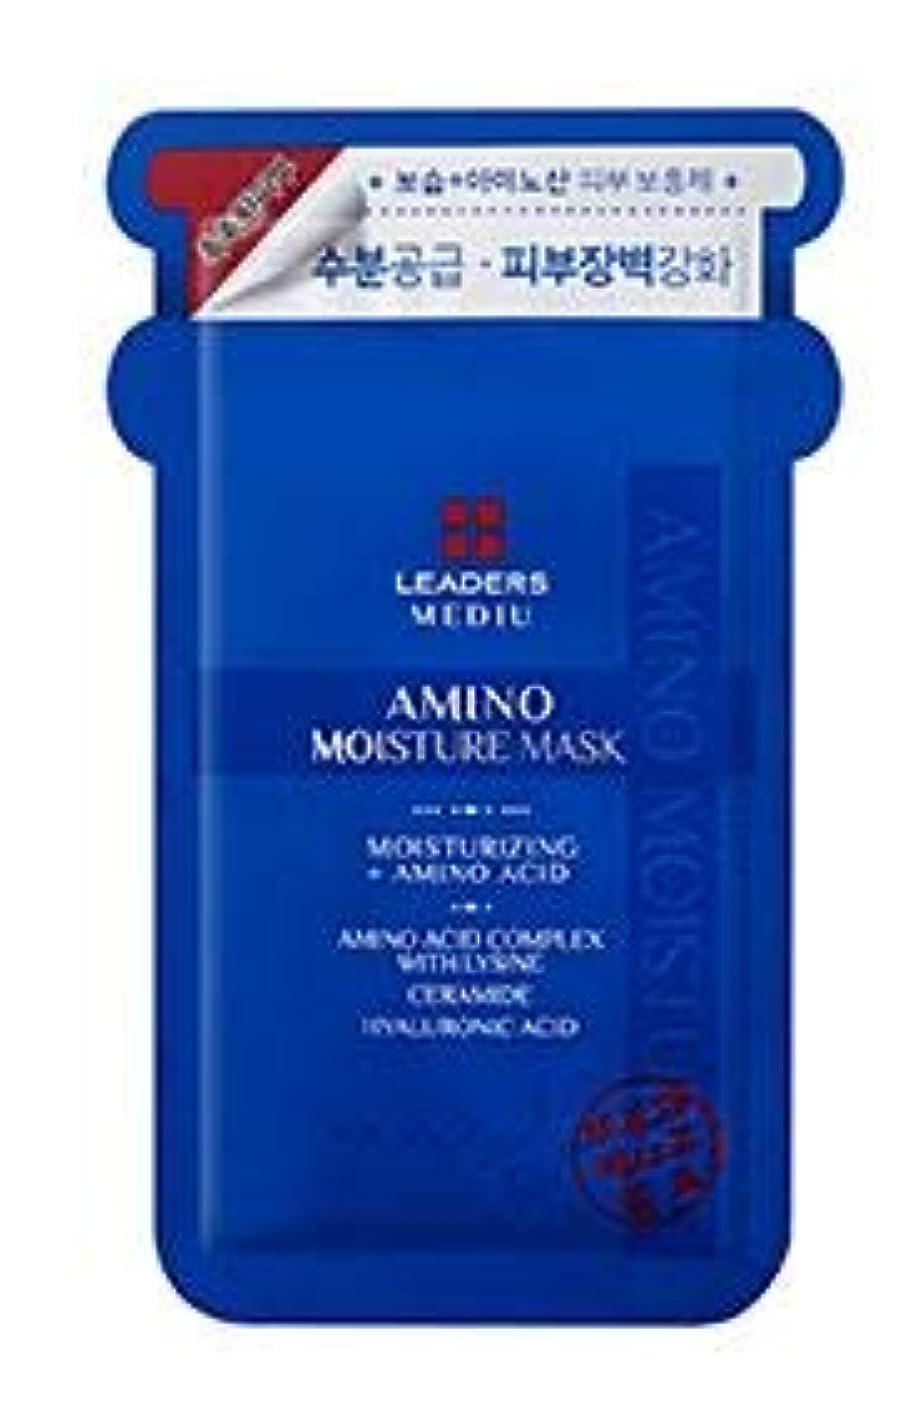 [LEADERS] MEDIU Amino Moisture Mask 25ml*10ea / リーダースアミノモイスチャーマスク 25ml*10枚 [並行輸入品]